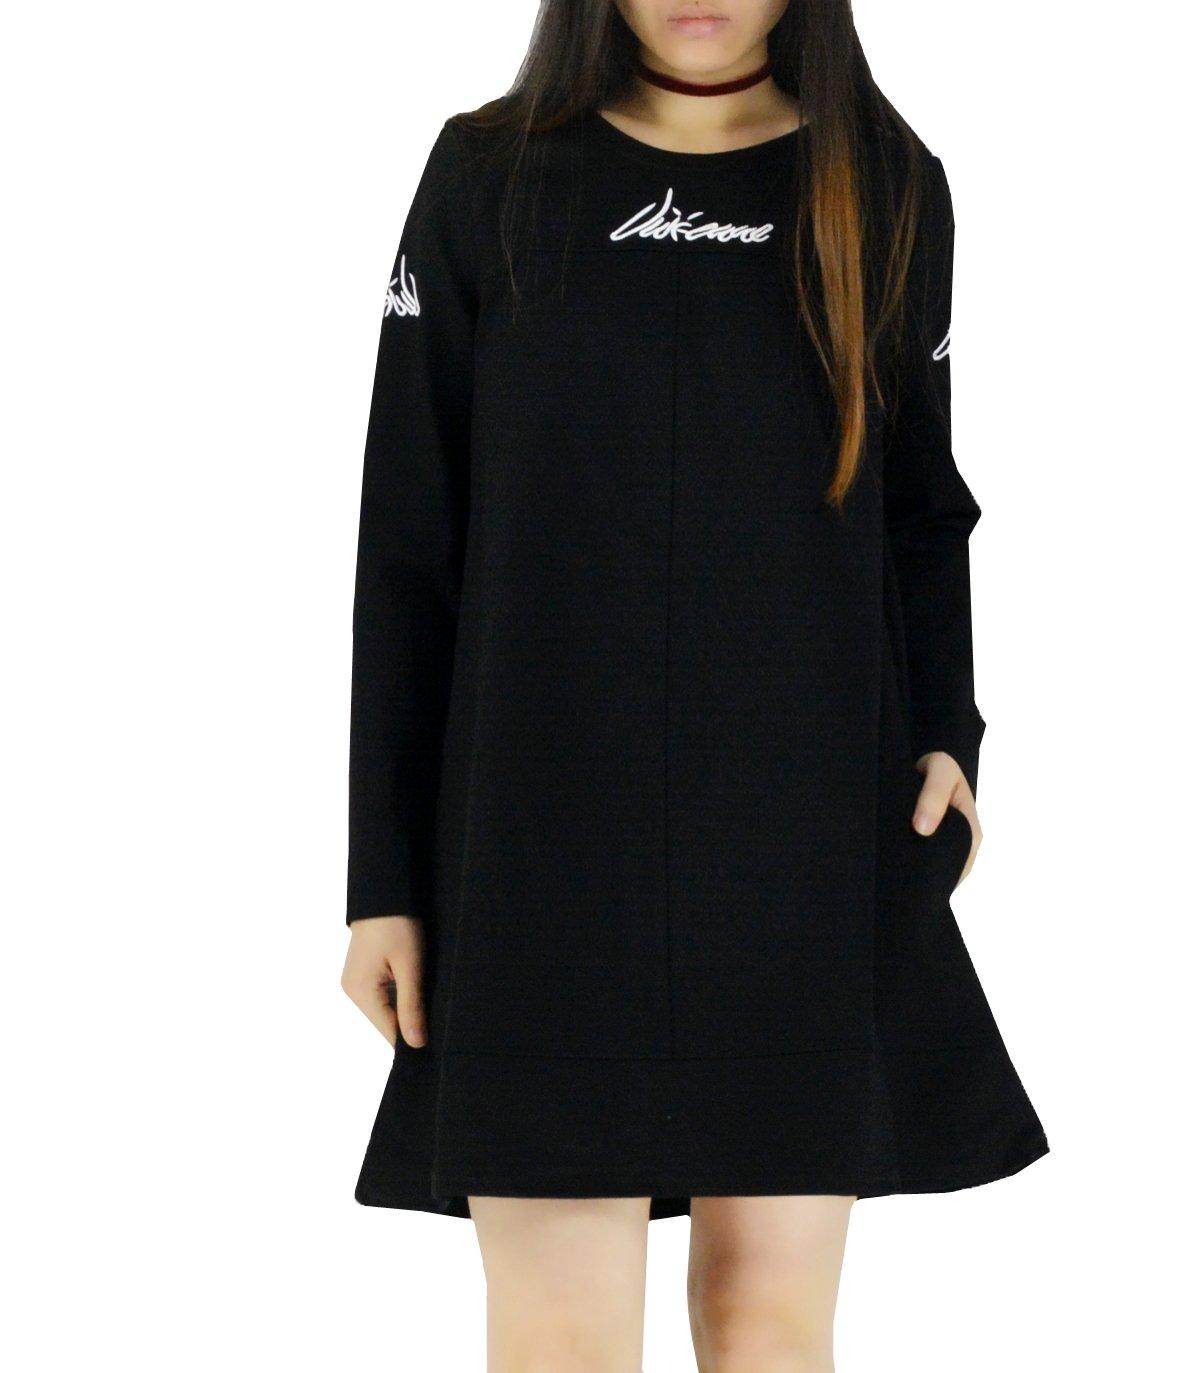 YSJ Women's Casual Oversized Loose Fit Tunic Long Sweatshirts Hoodie Dress (Black, L)